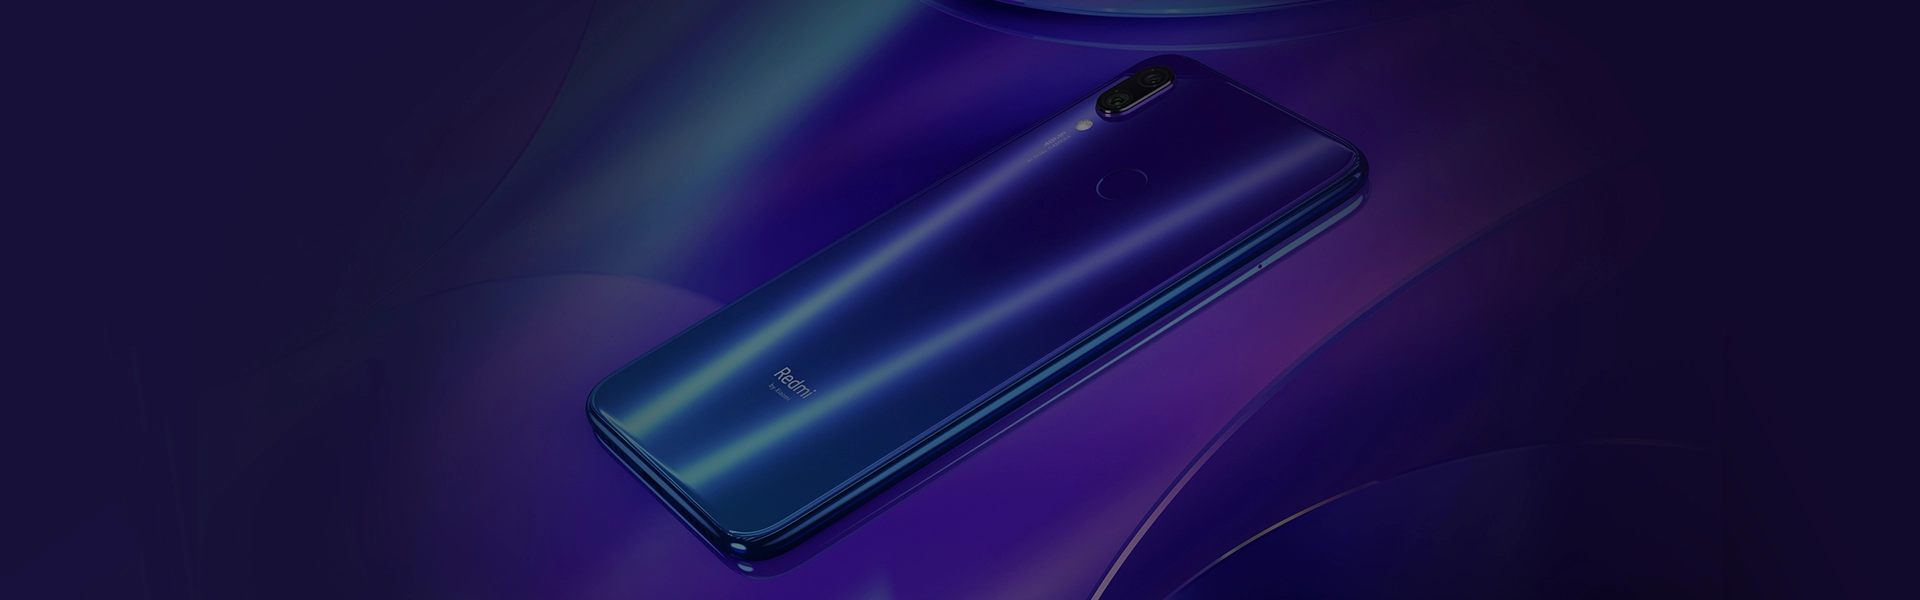 Redmi Note 7: сдвигающий горизонт